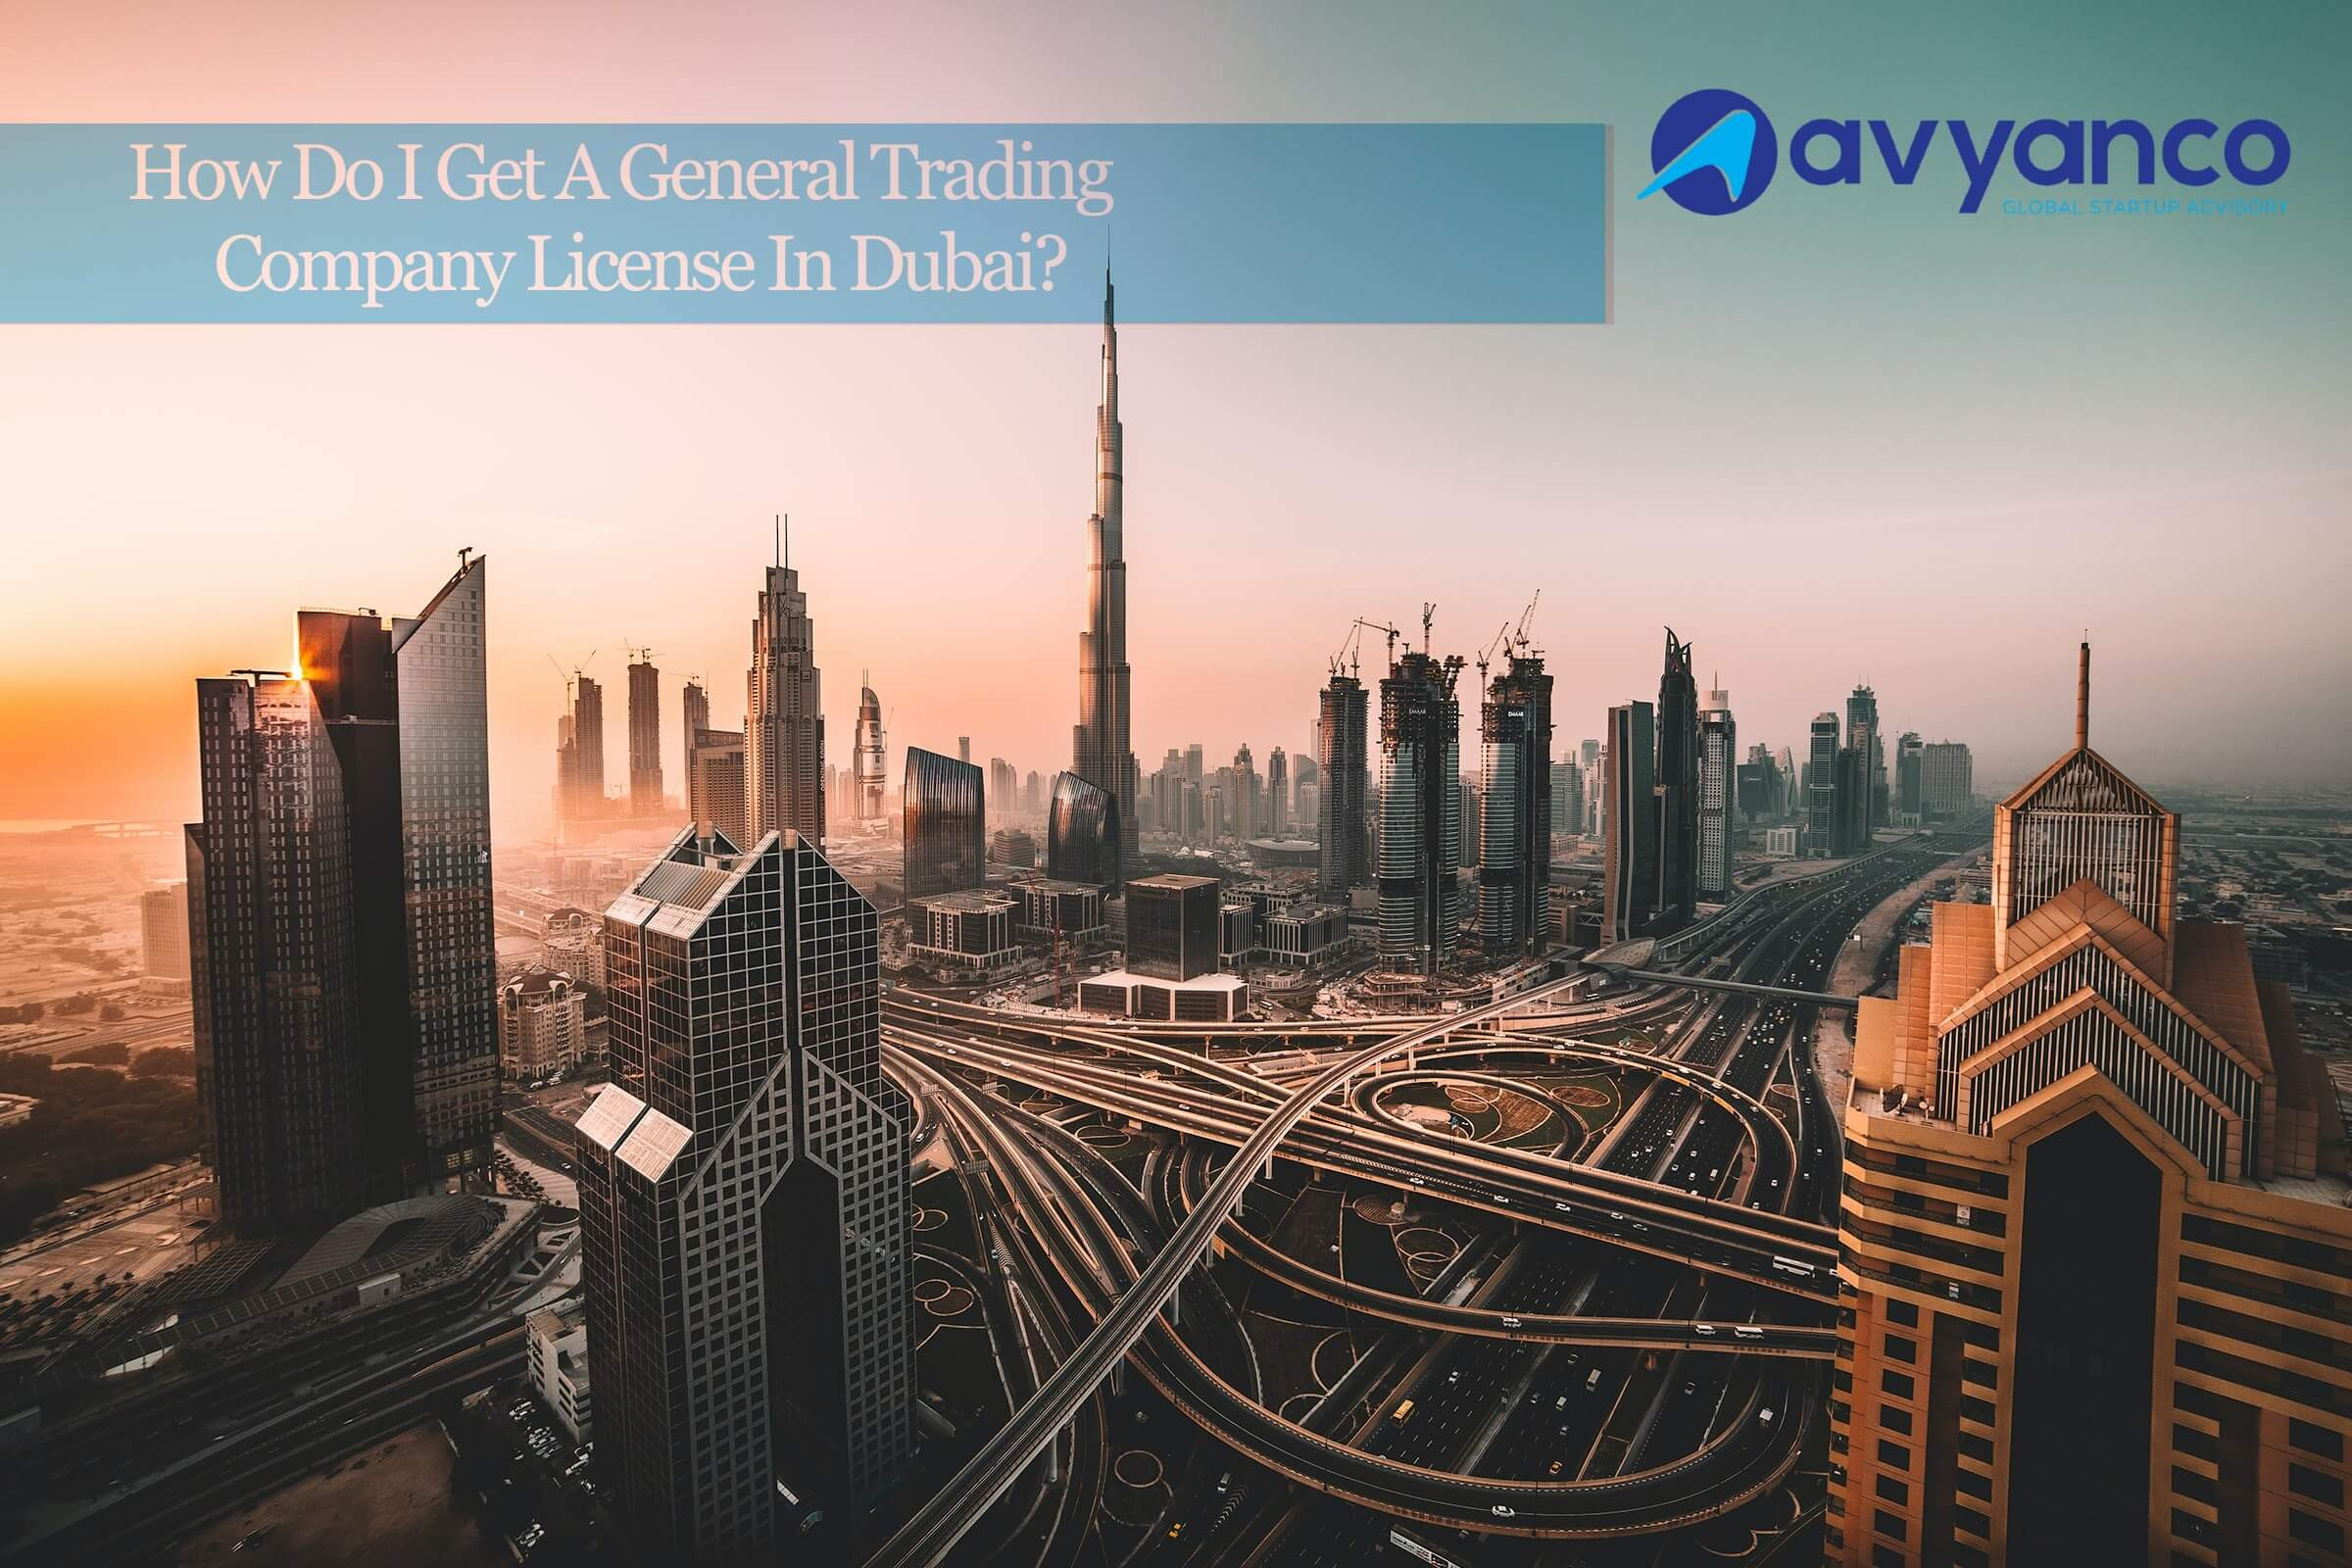 trading company in Dubai